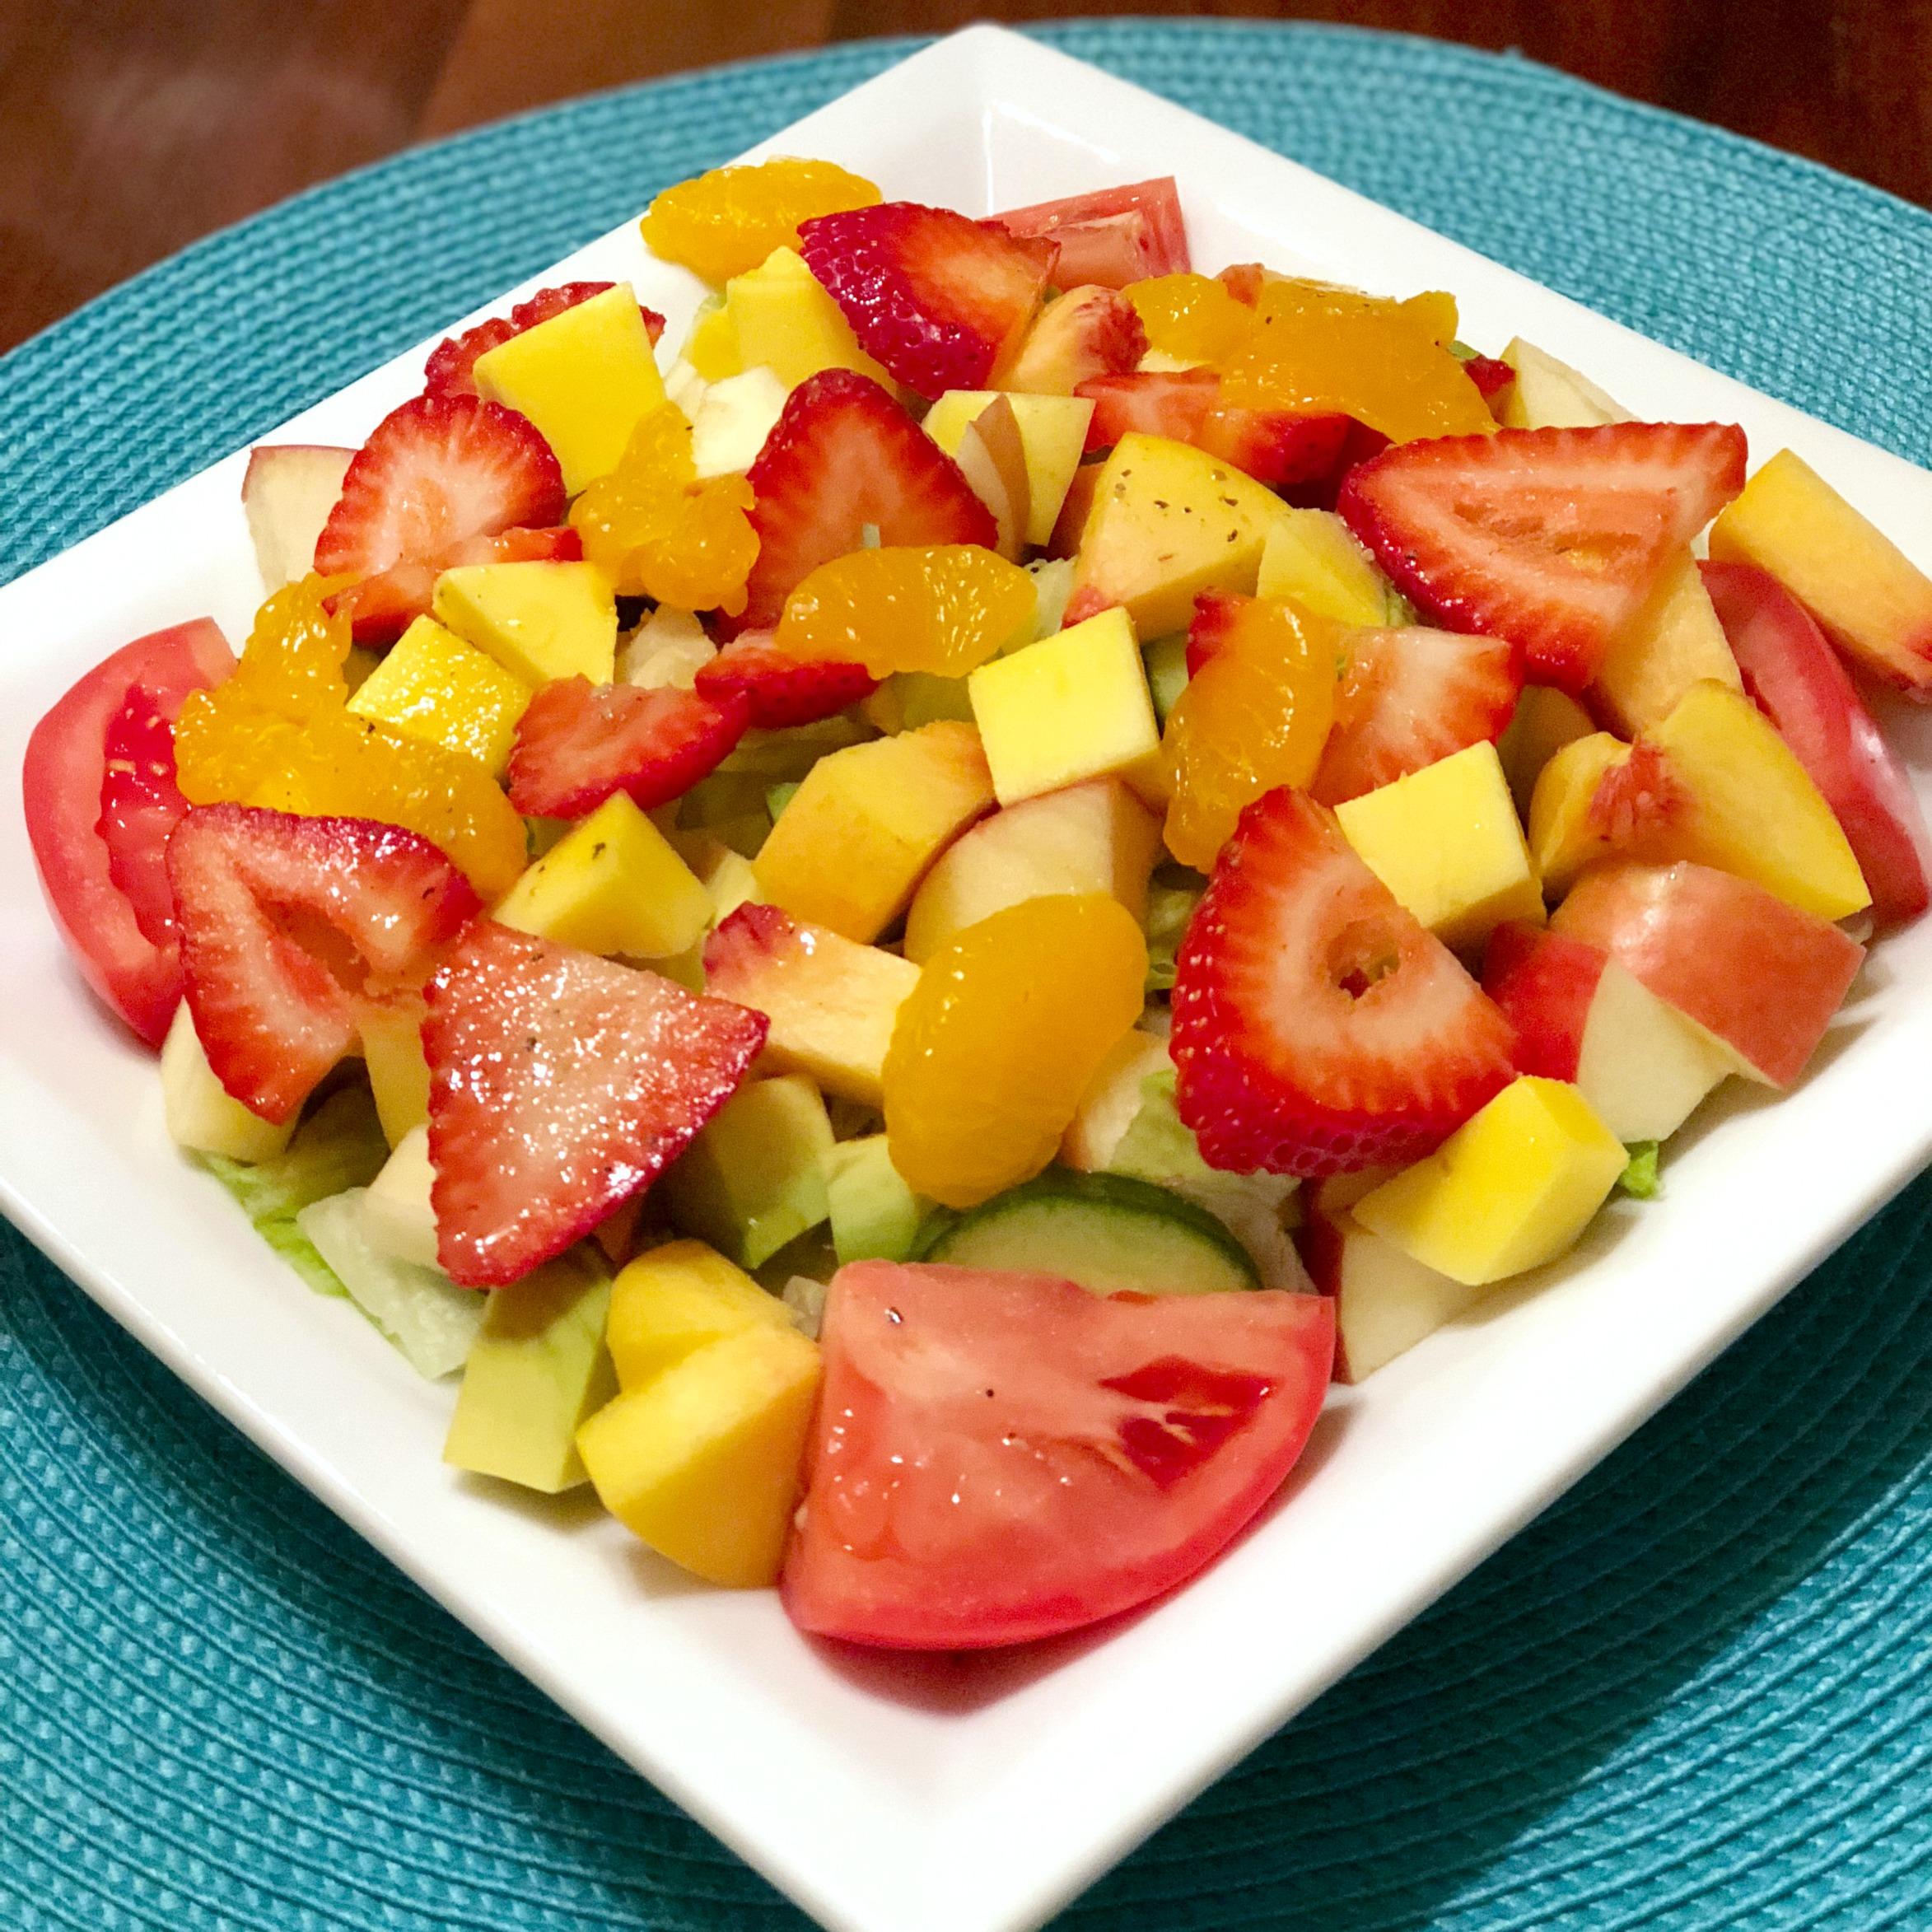 Scrumptious Breakfast Salad